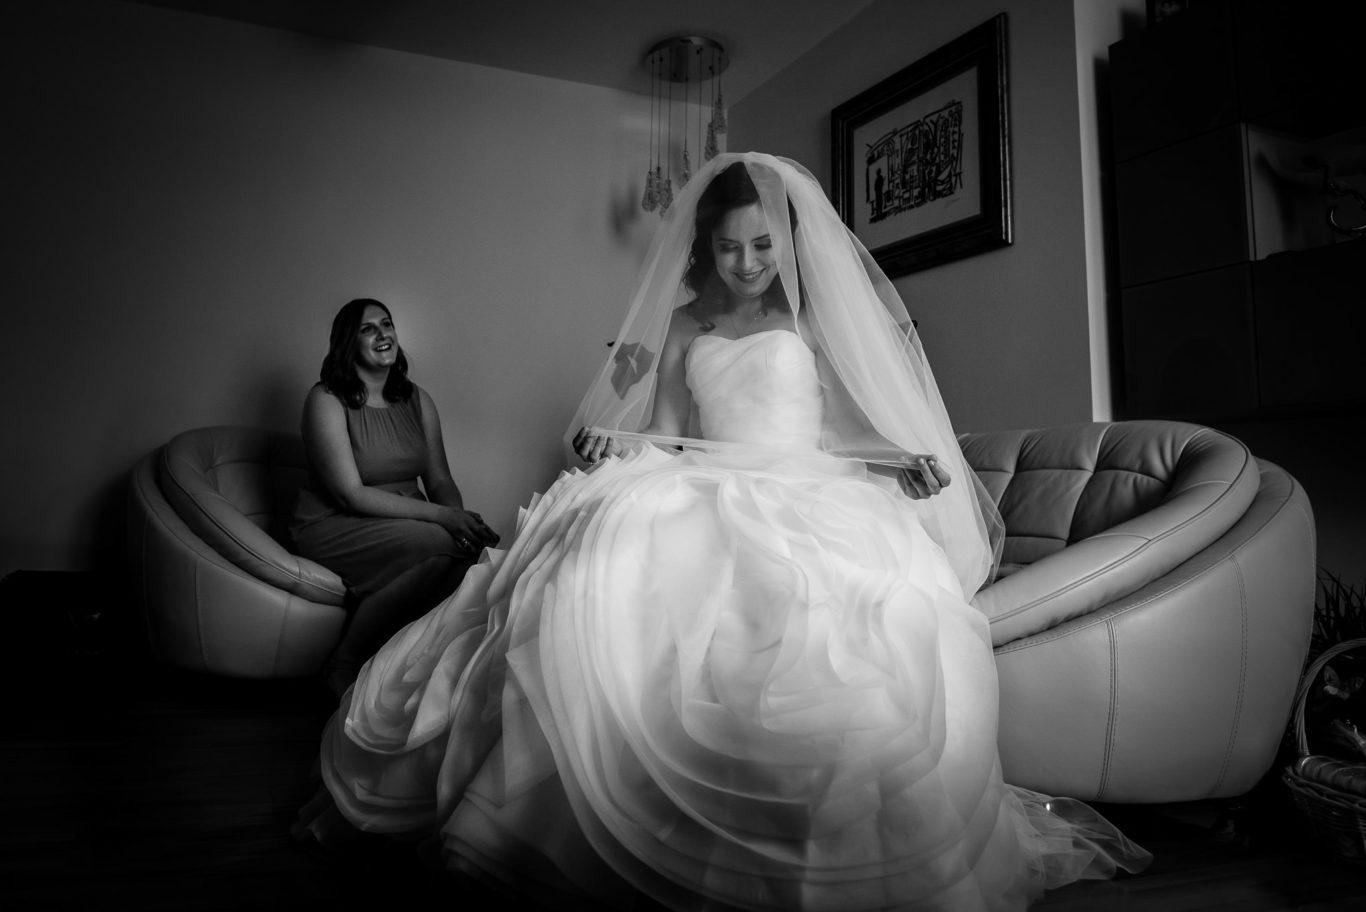 0235-Fotografie-nunta-Simona-Valentin-fotograf-Ciprian-Dumitrescu-DSC_1070